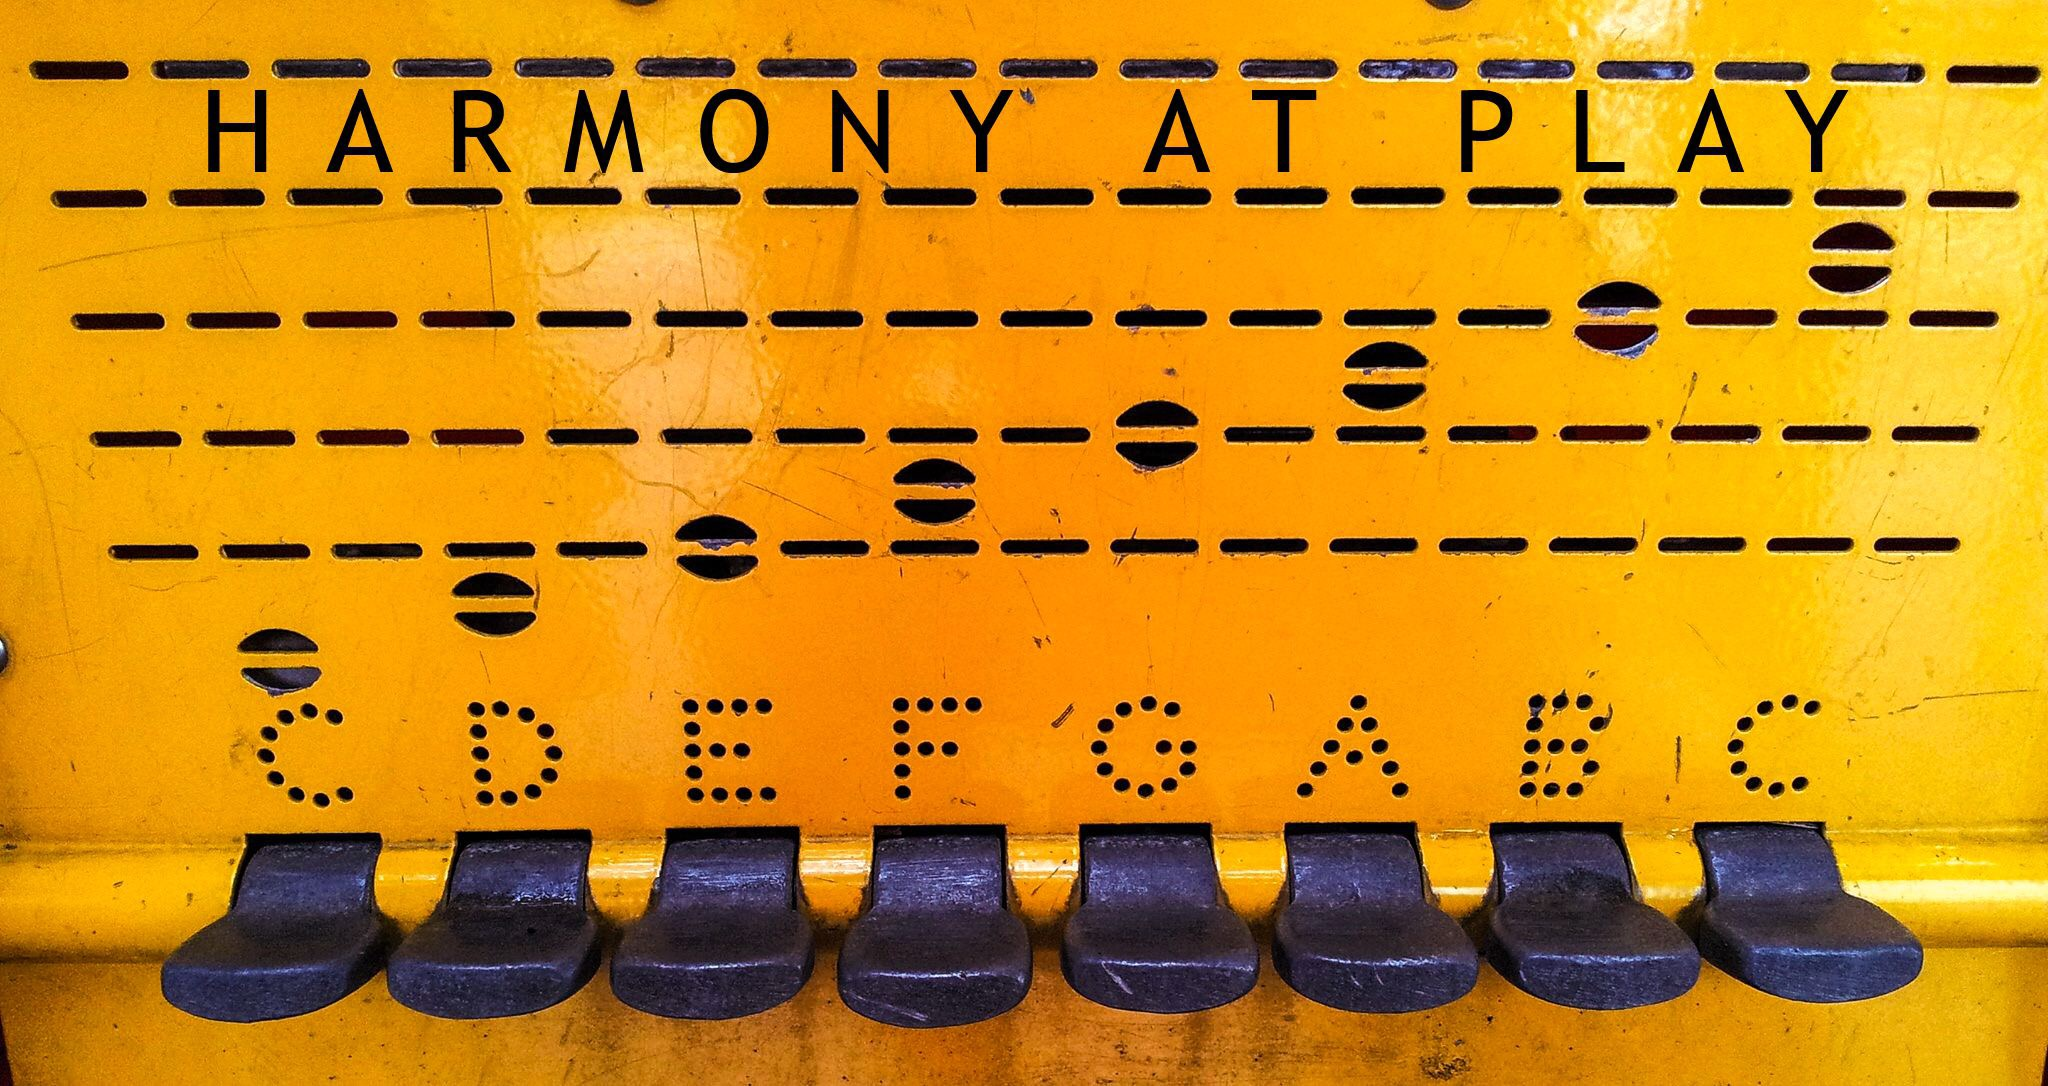 Harmony At Play cover.JPG